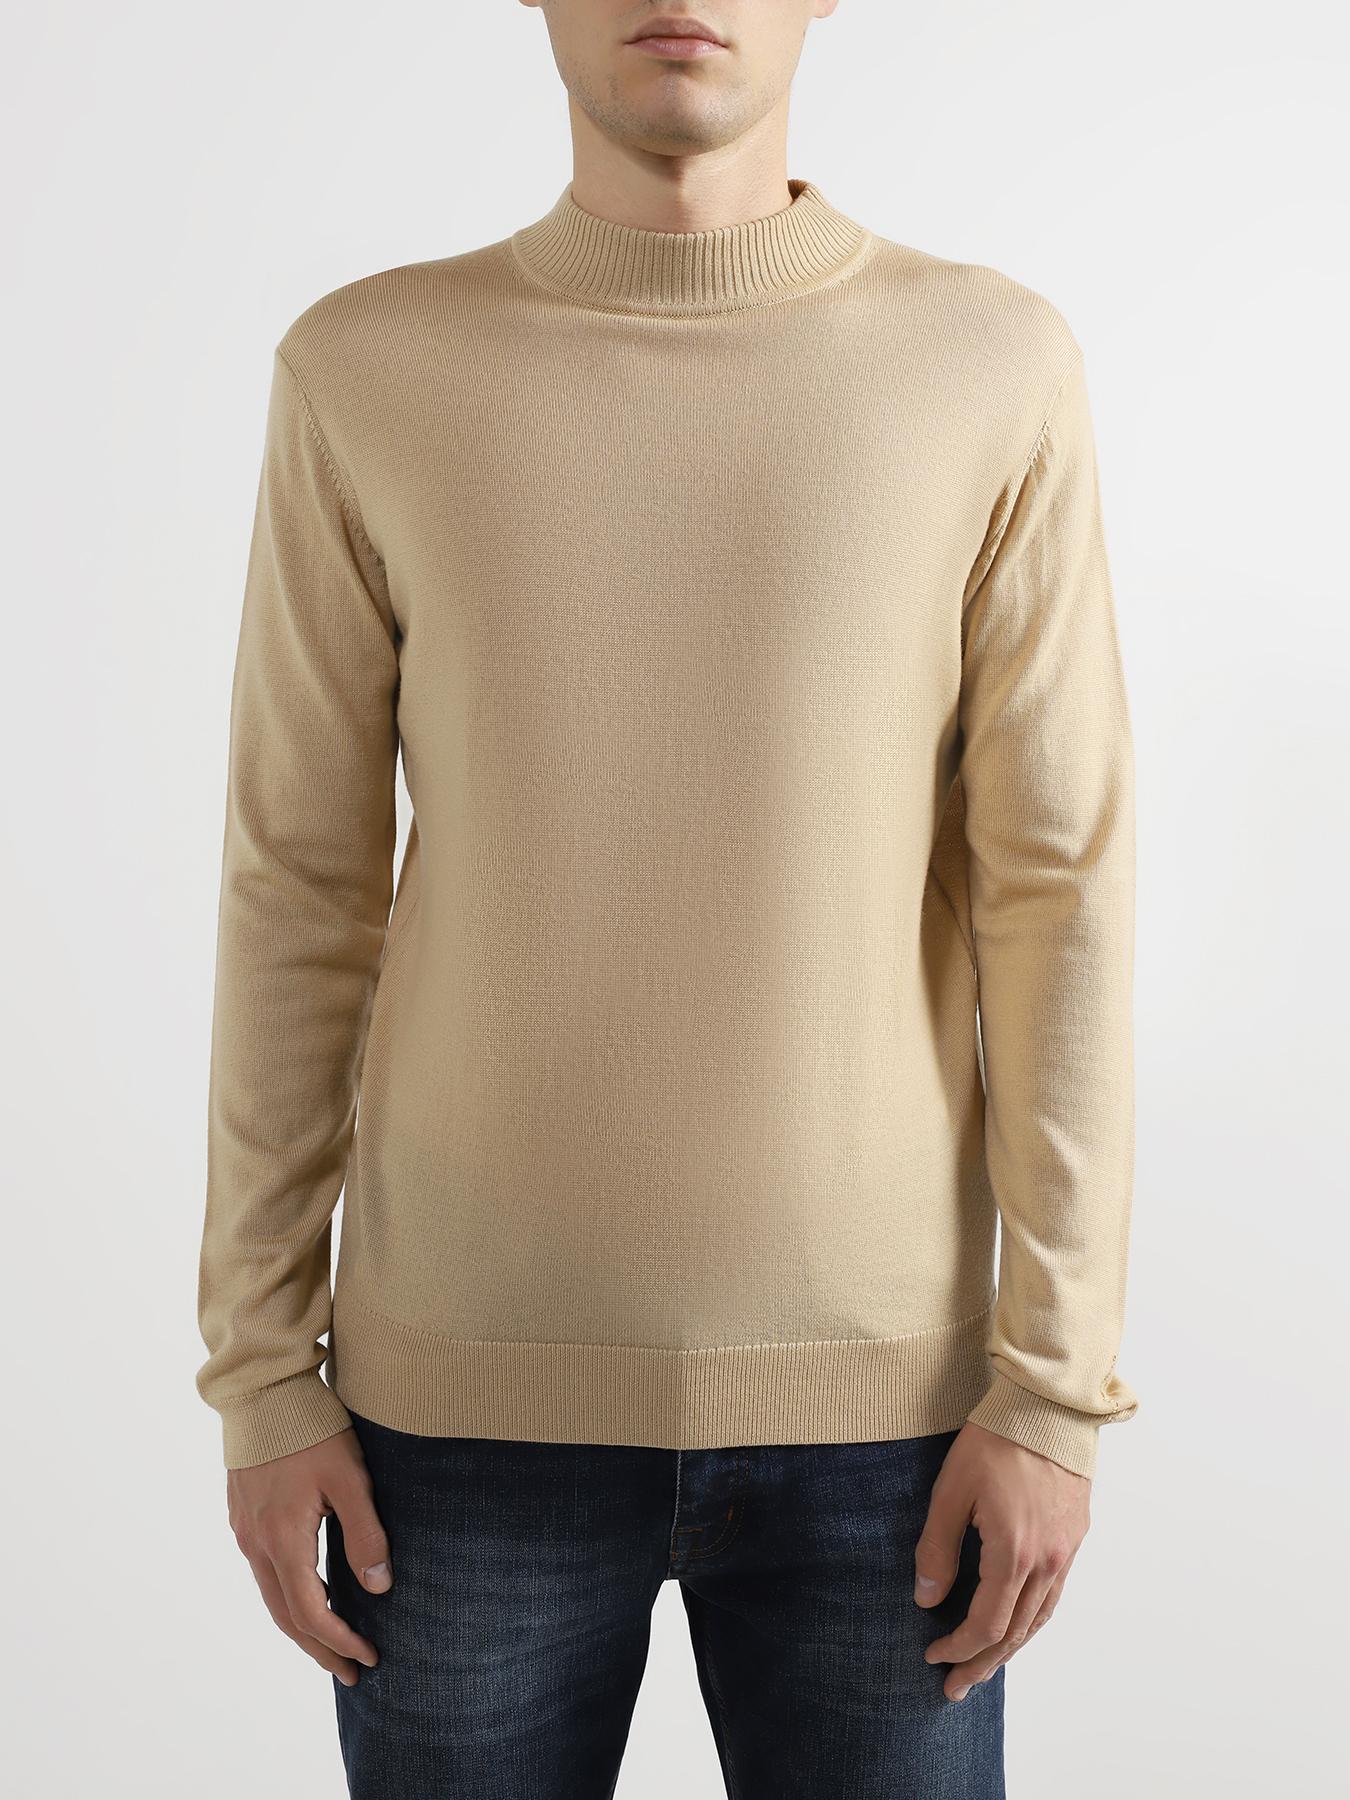 Фото - Свитеры Karl Lagerfeld Свитер karl lagerfeld свитер